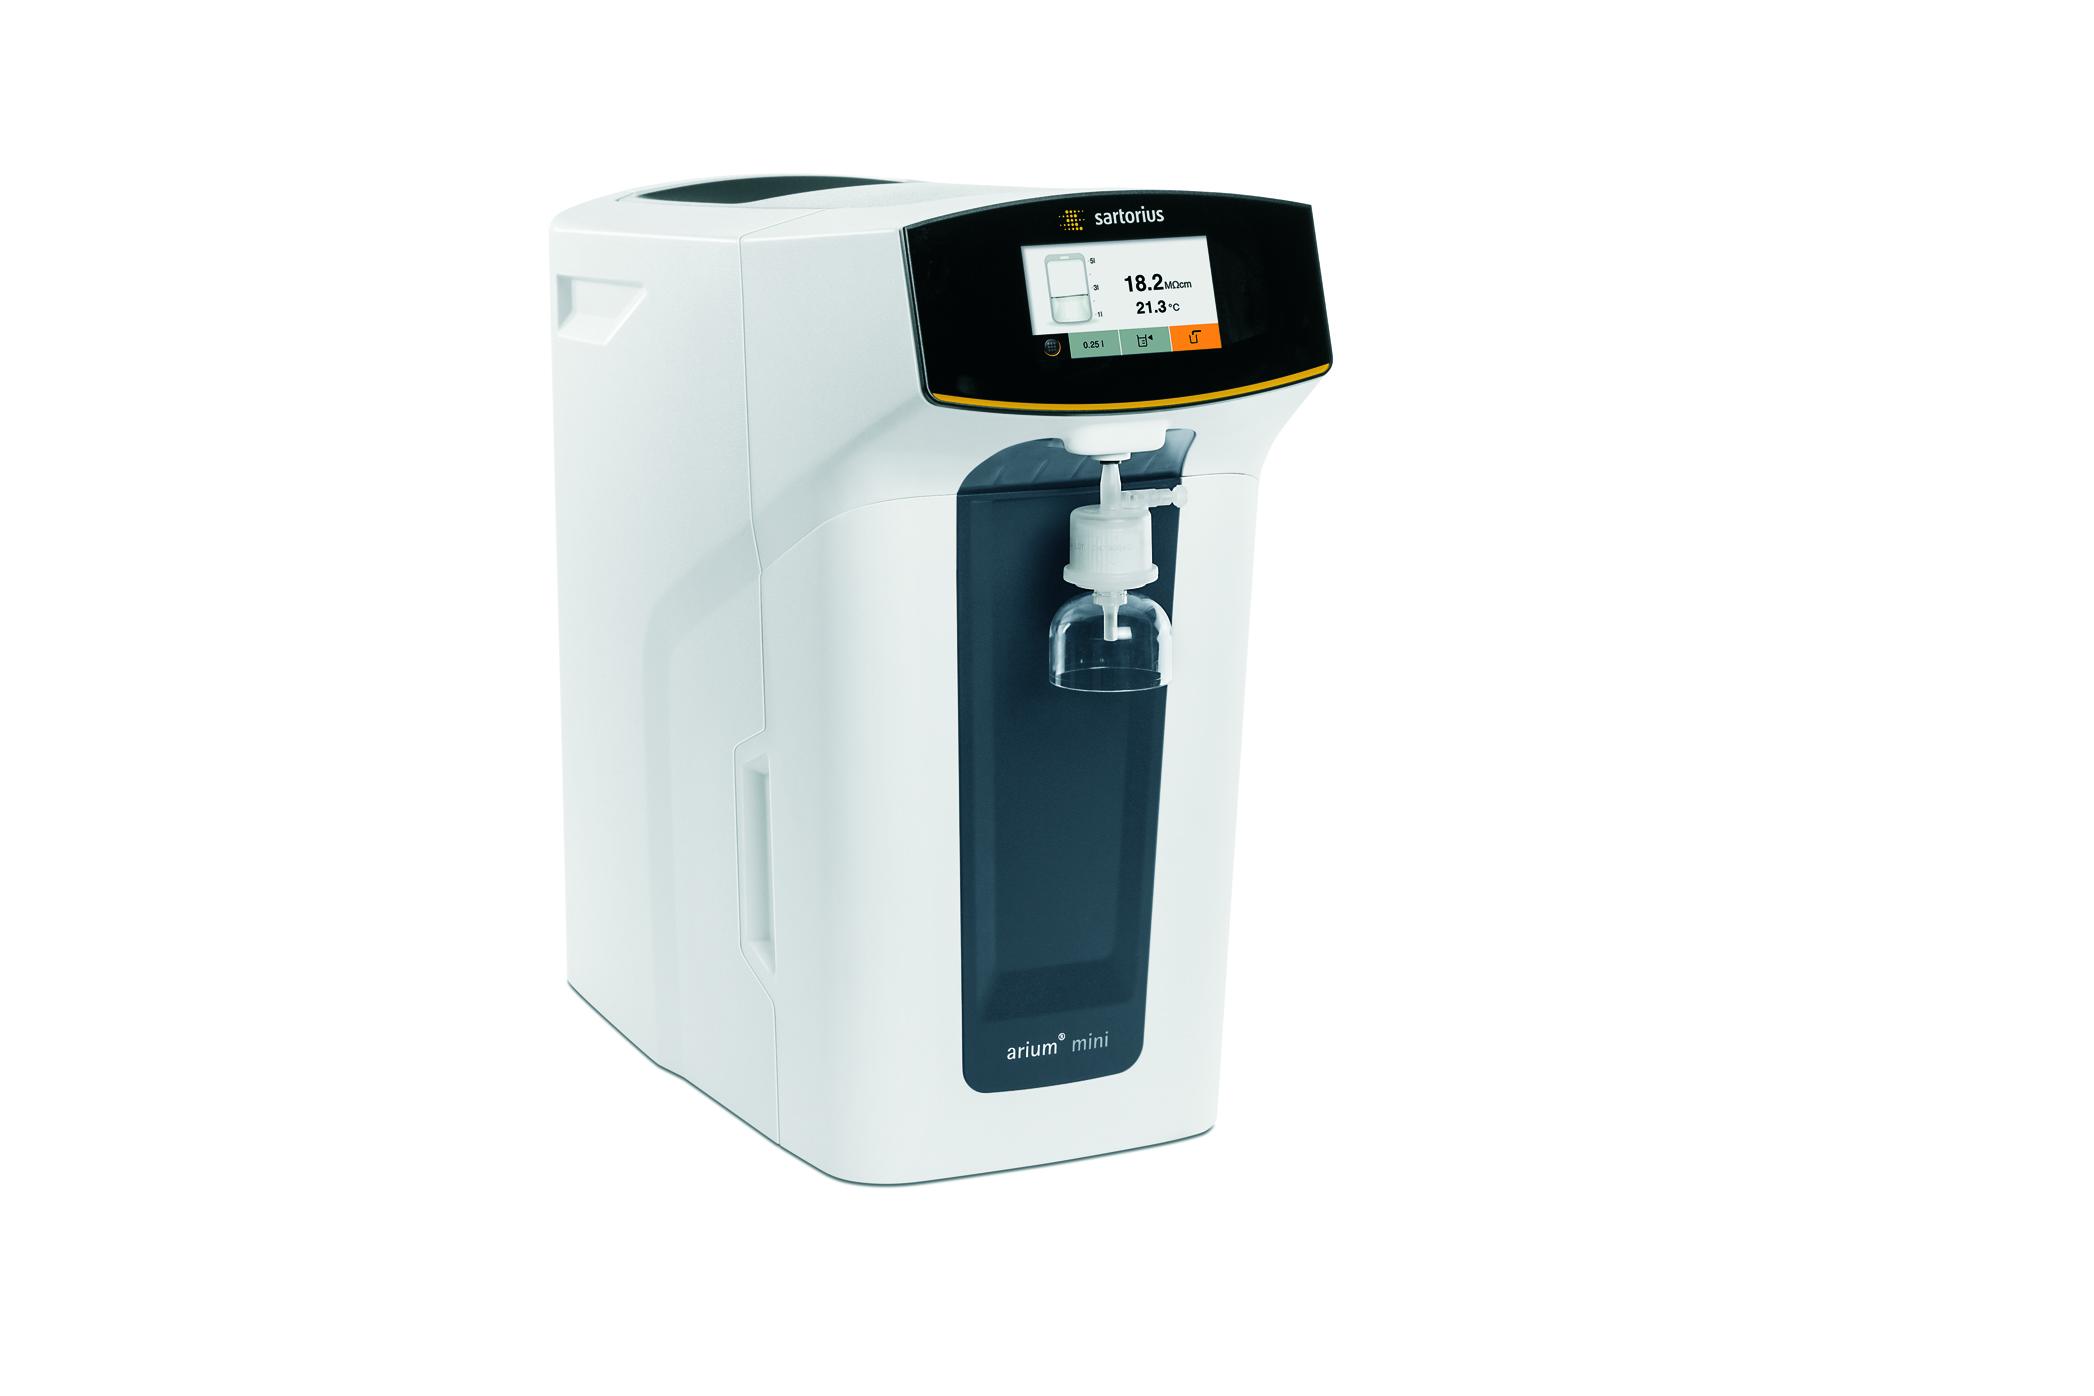 arium mini essential featuring DI water taps